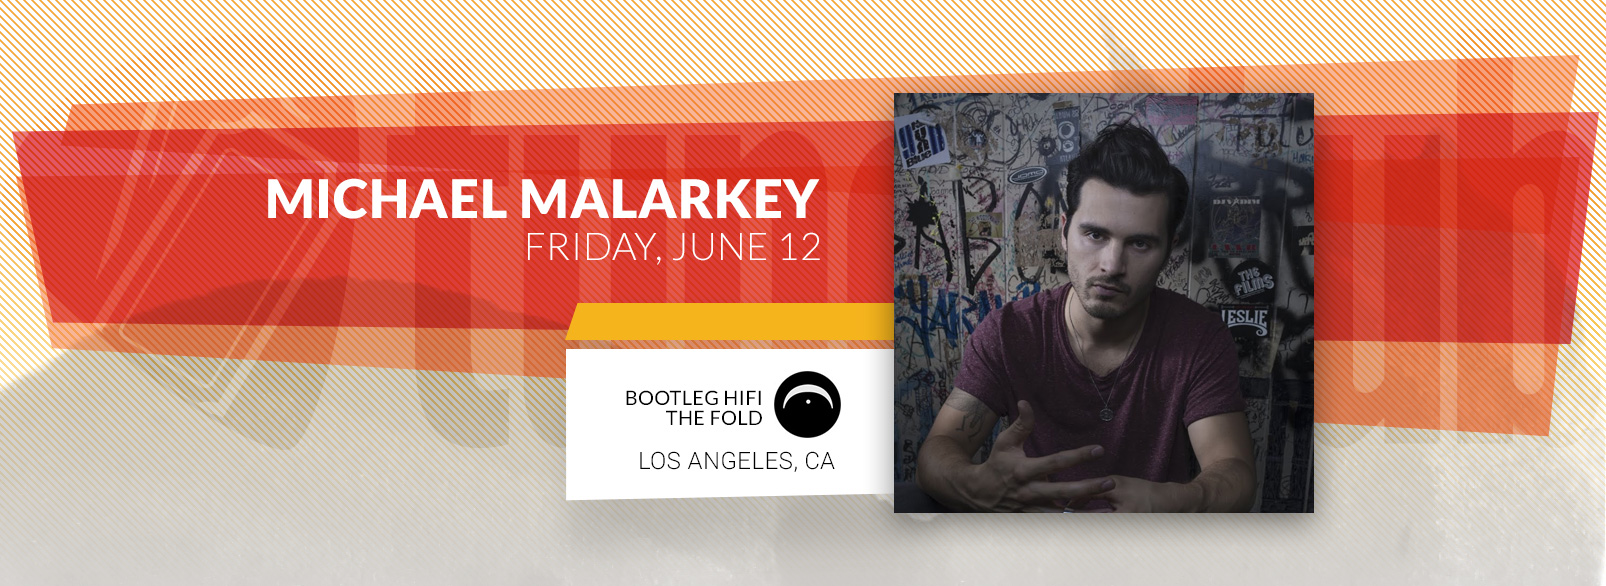 Michael Malarkey @ The Fold